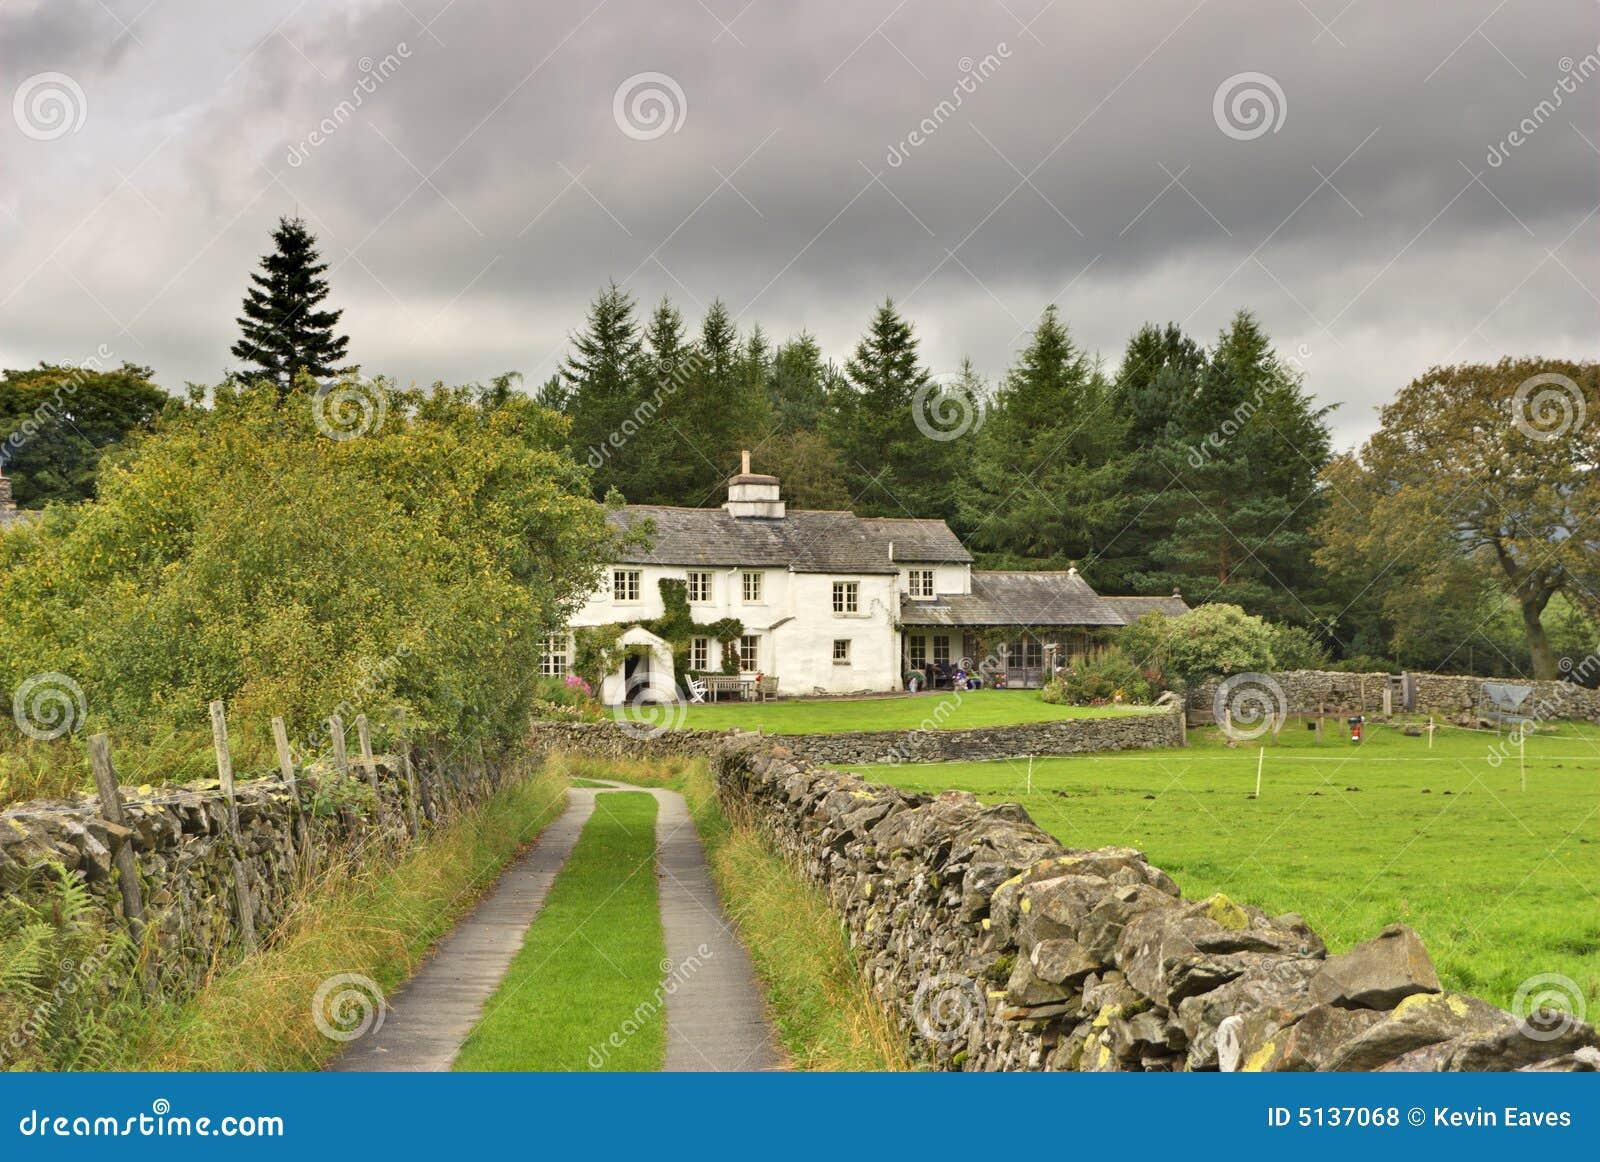 Cottage bianco inglese in terreno boscoso fotografie stock for Planimetrie del cottage del cortile